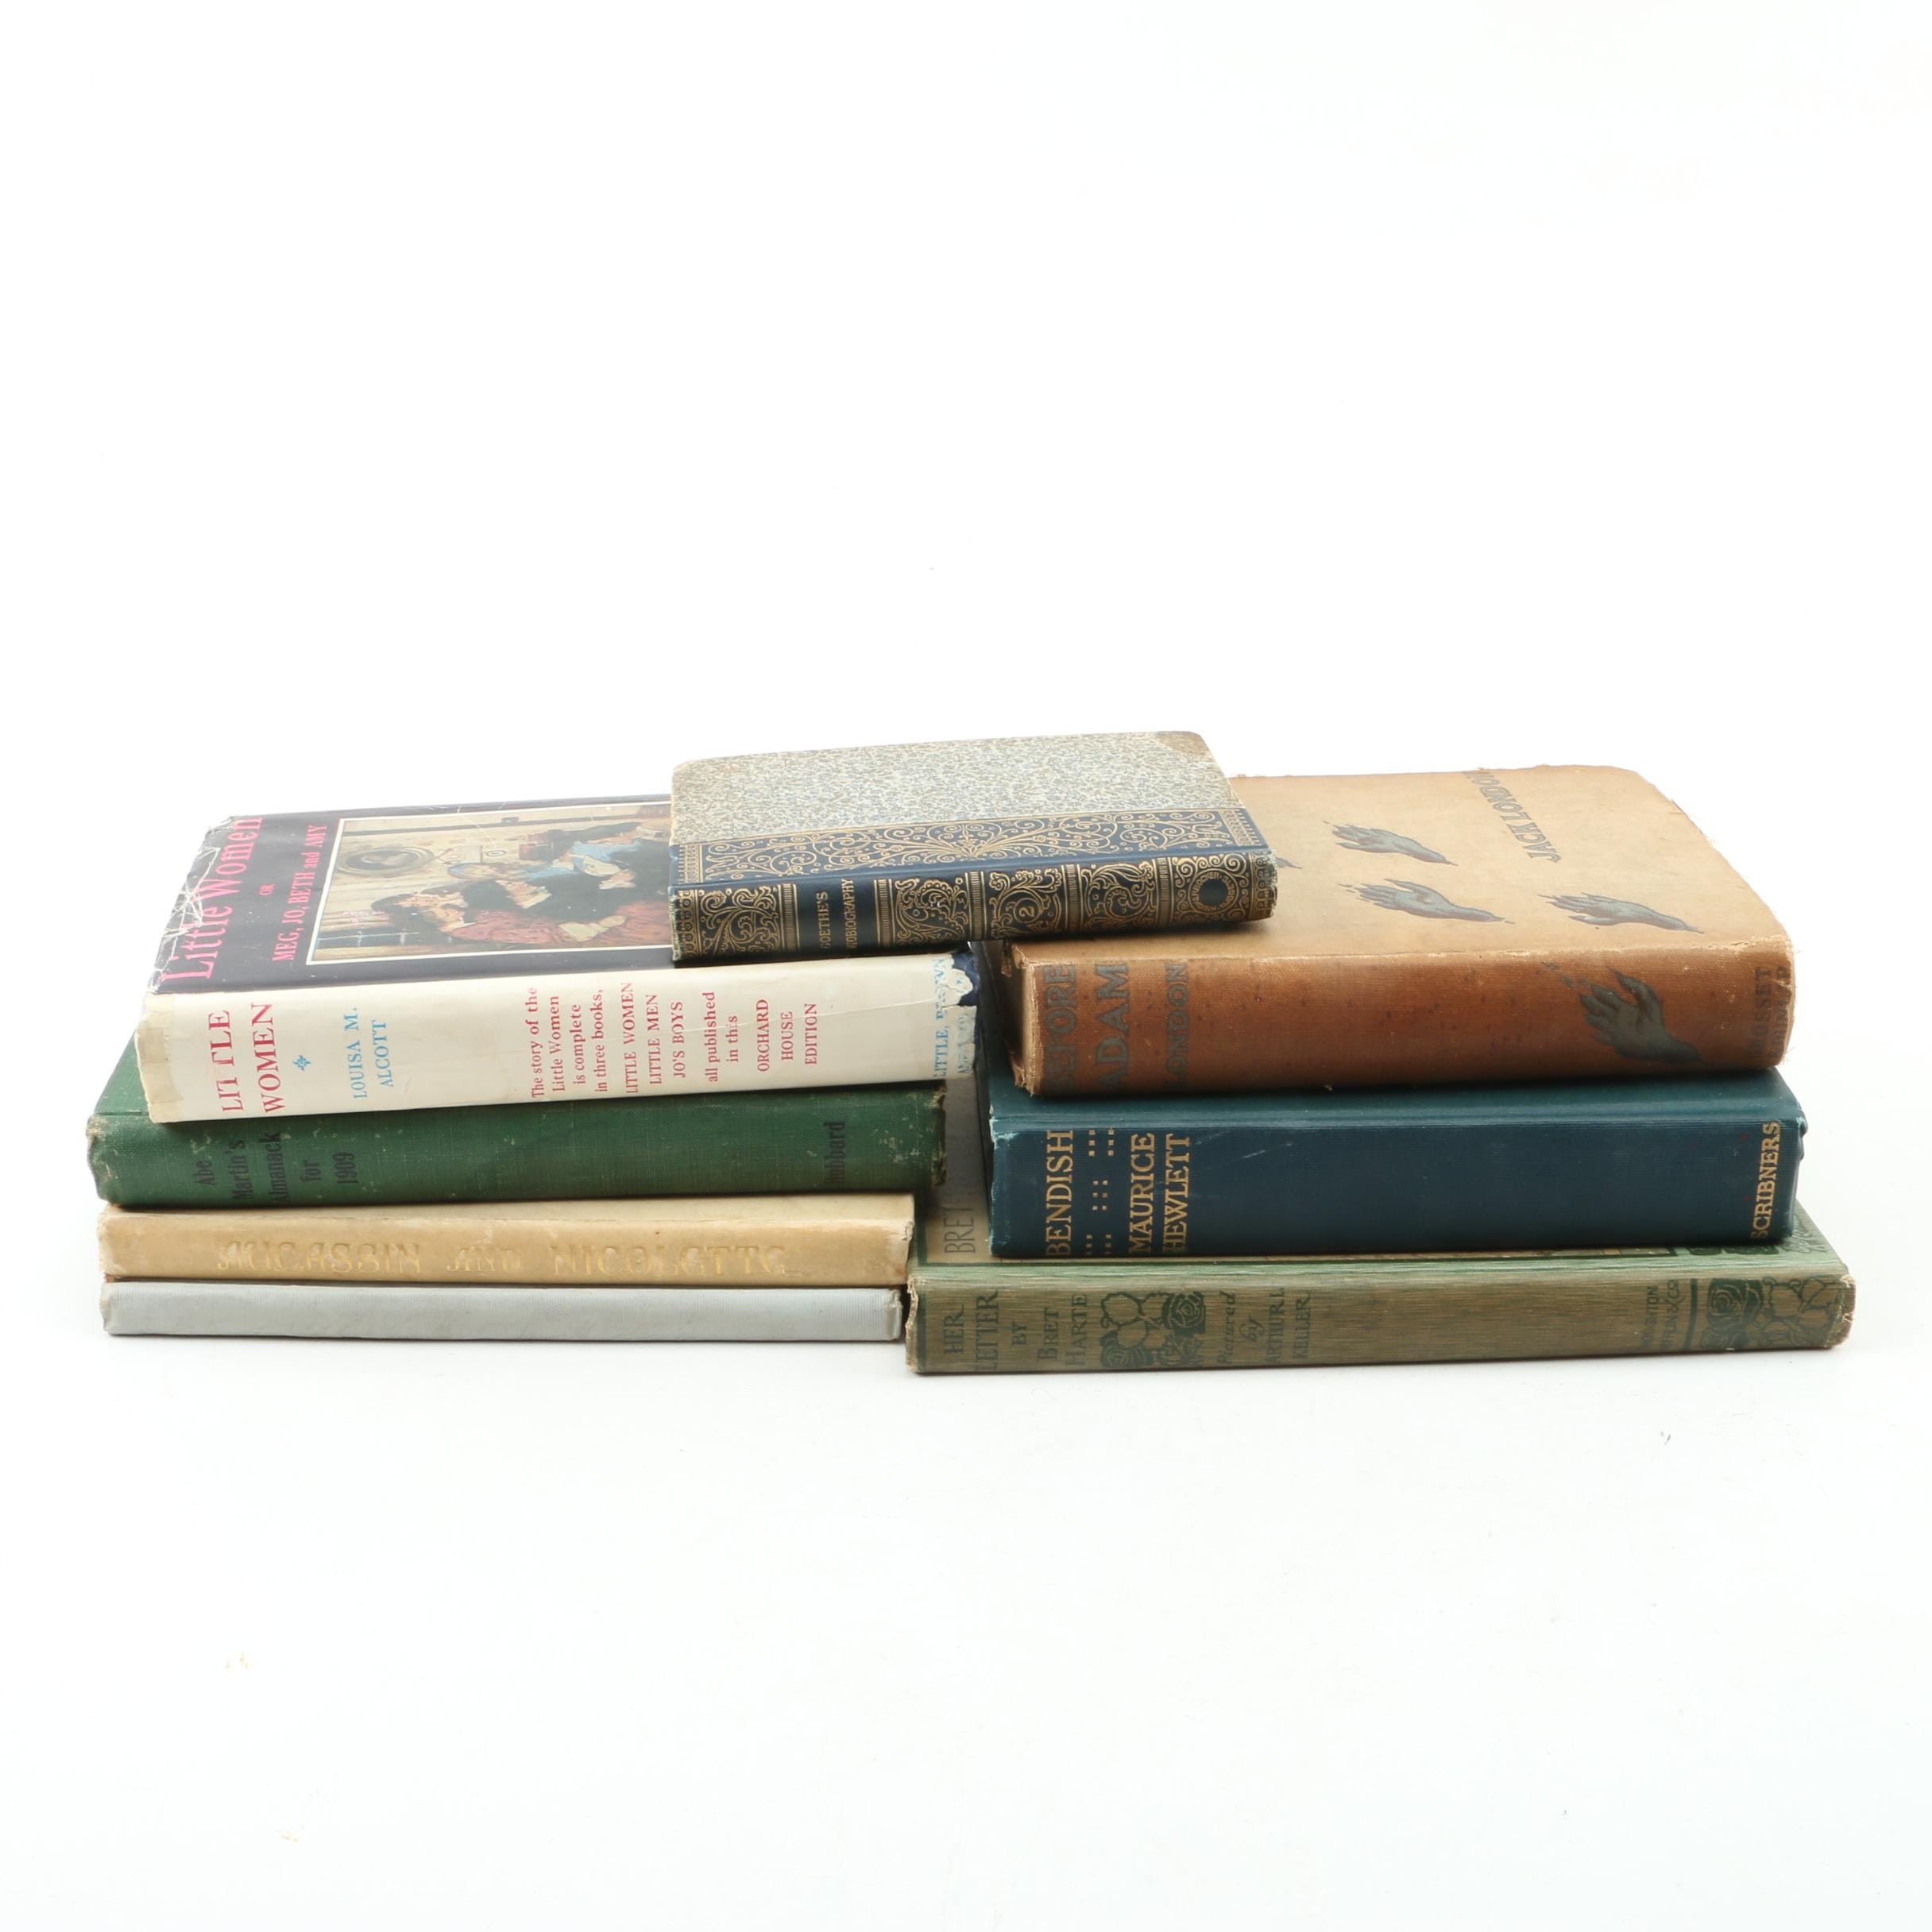 Vintage and Antique Books Including Jack London, Bret Harte and Laurence Housman